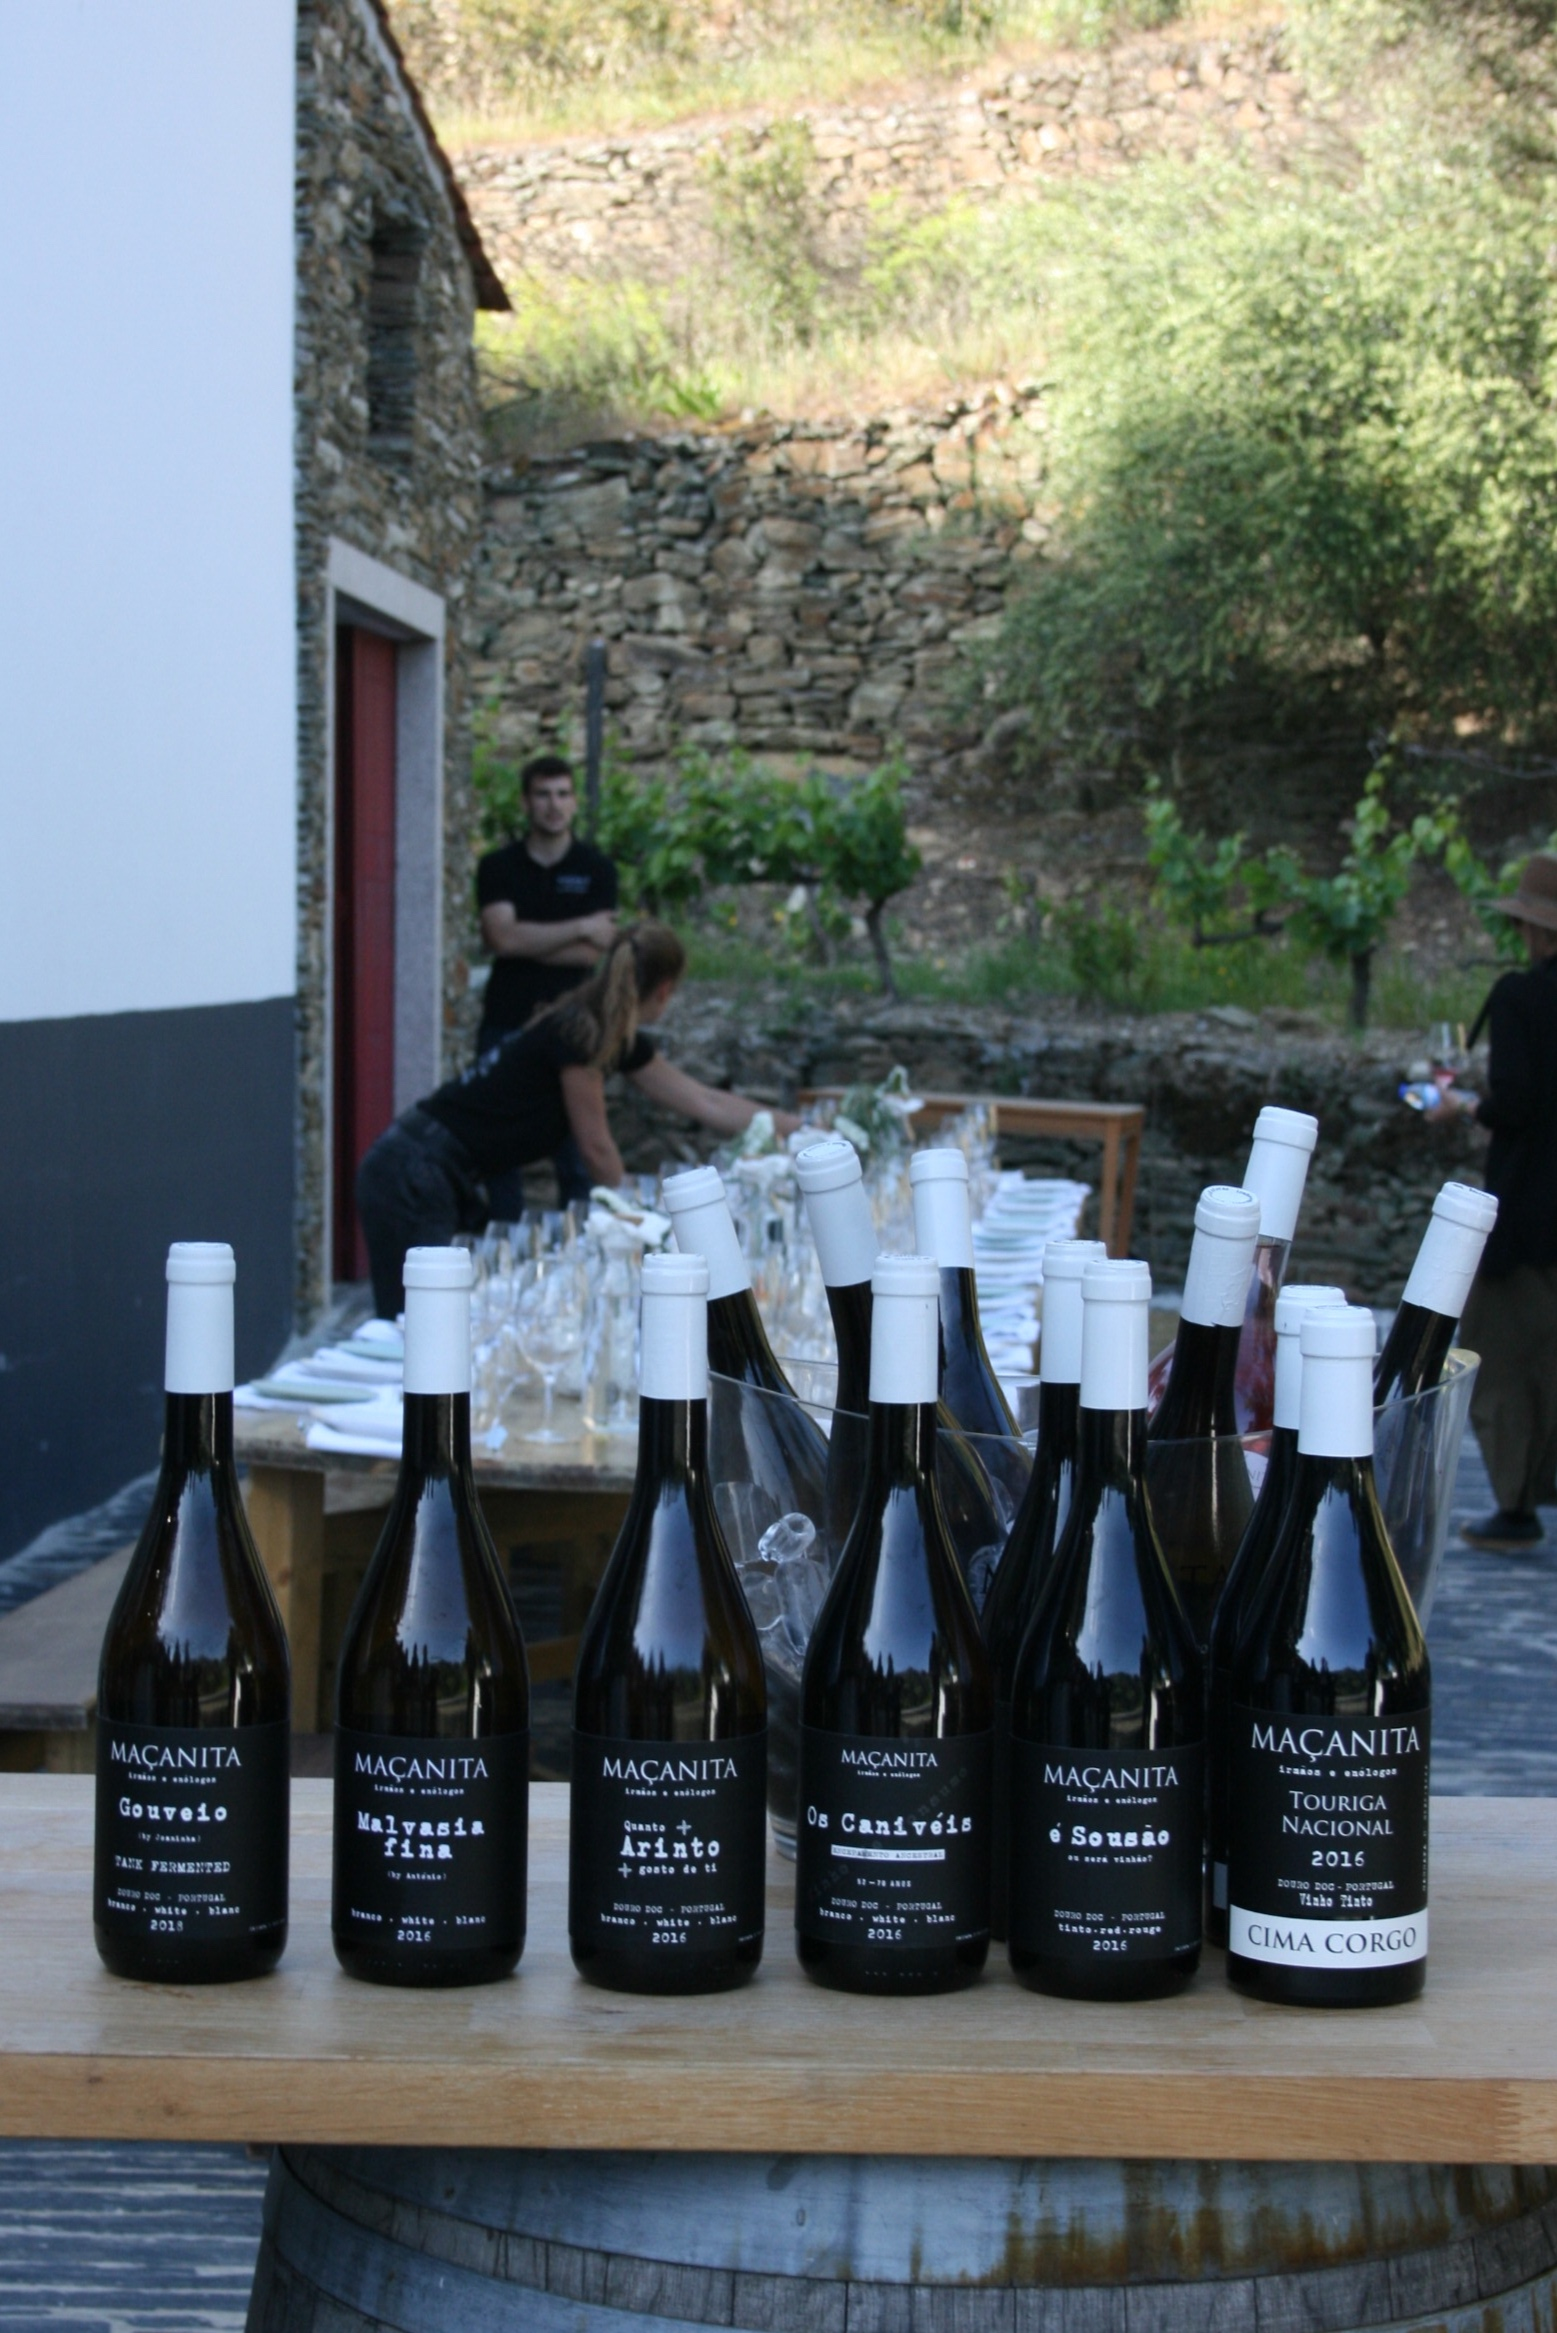 Macanitas winery in Douro Valley.